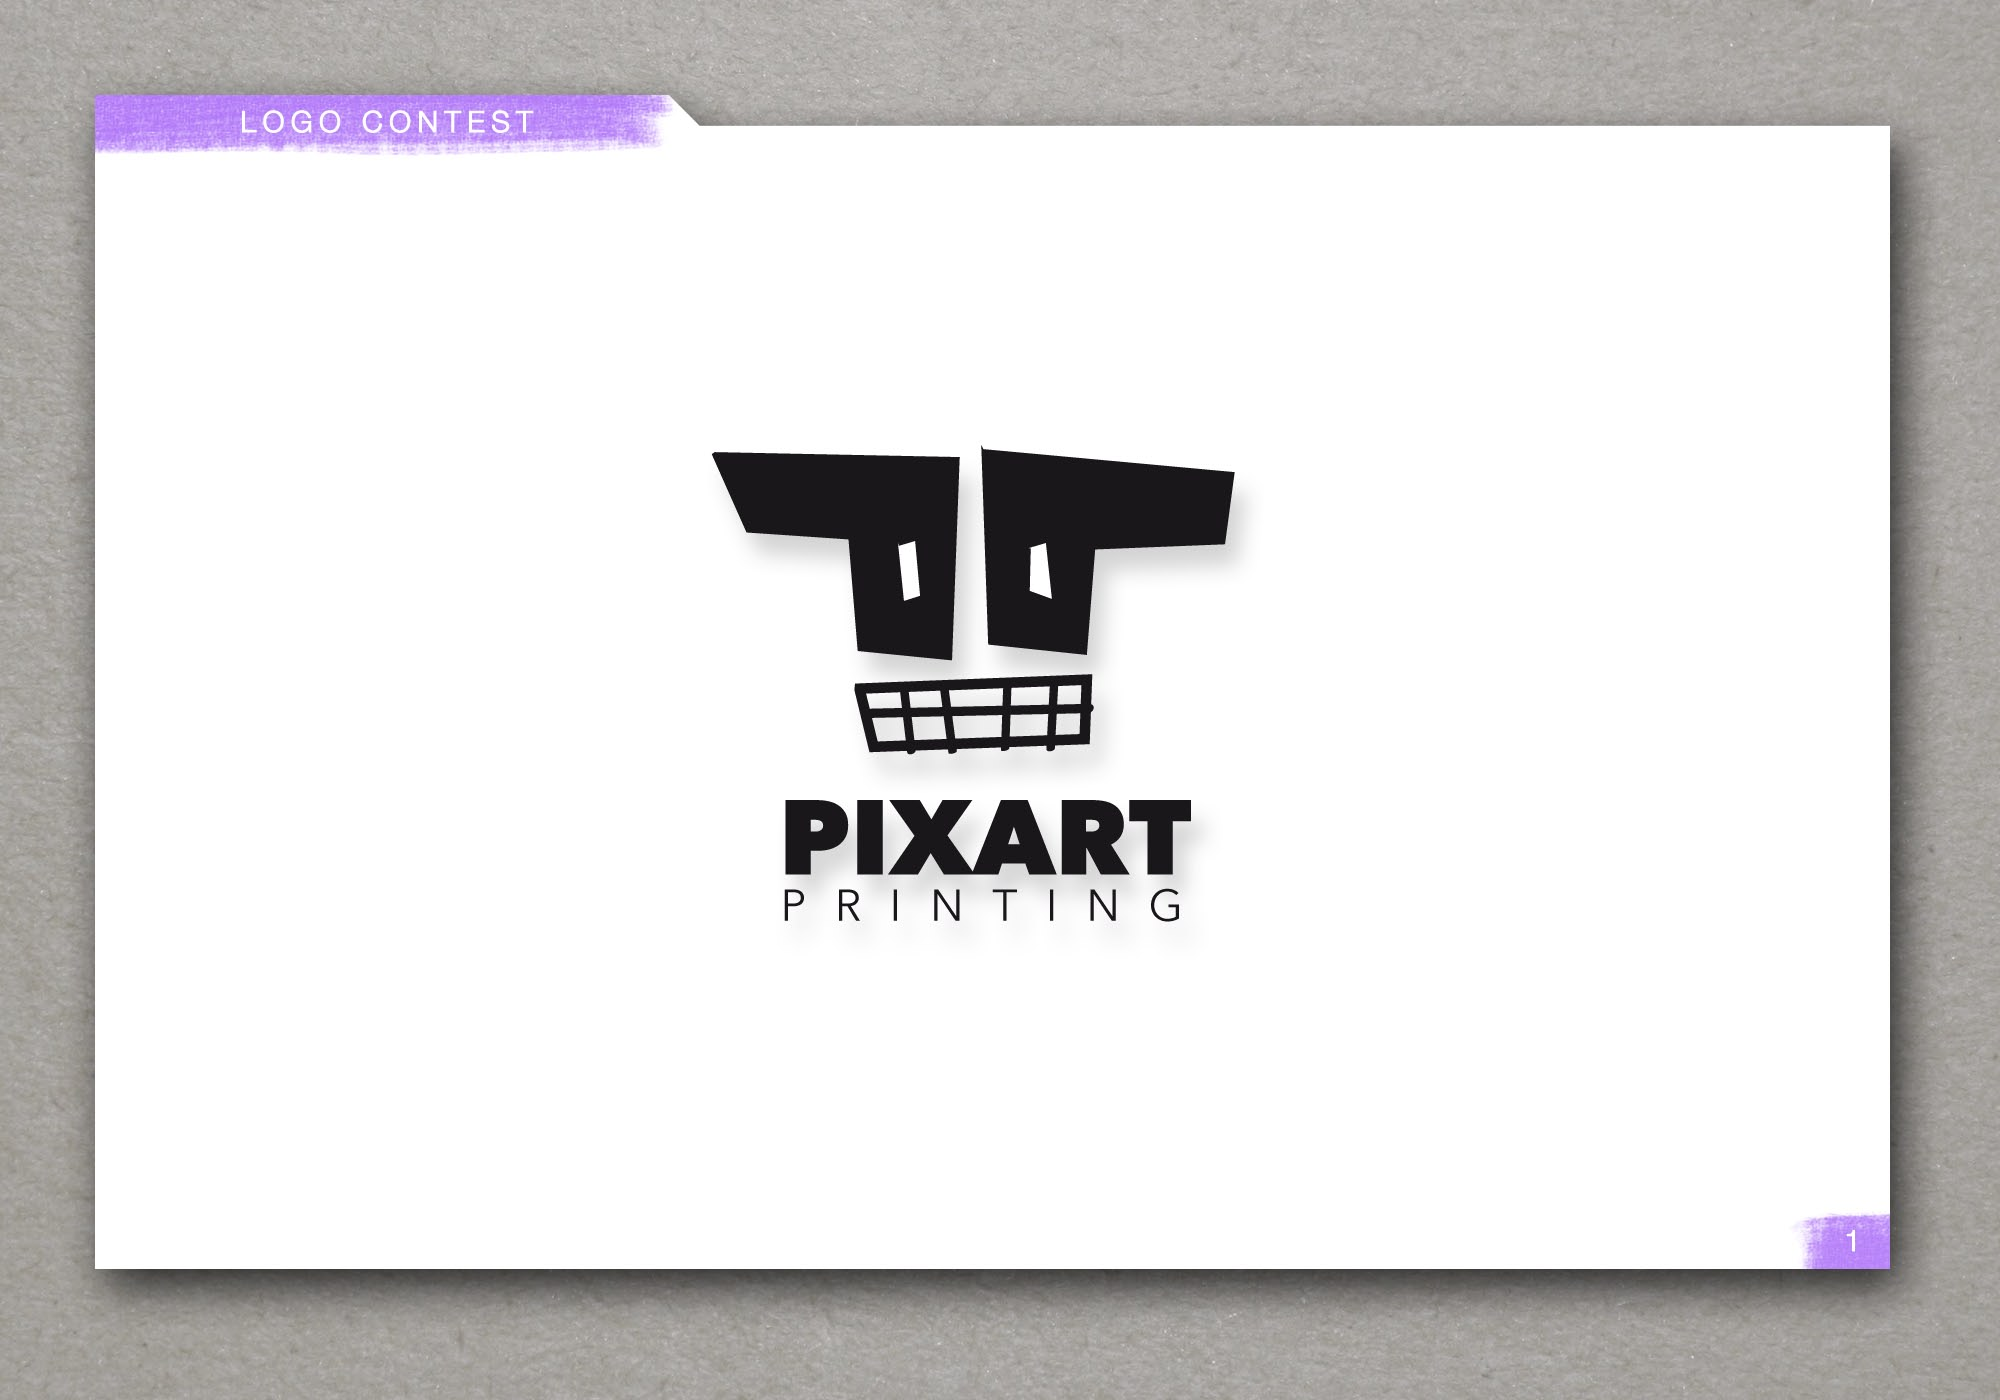 PIXARTprinting logo contest_Page_1.jpg